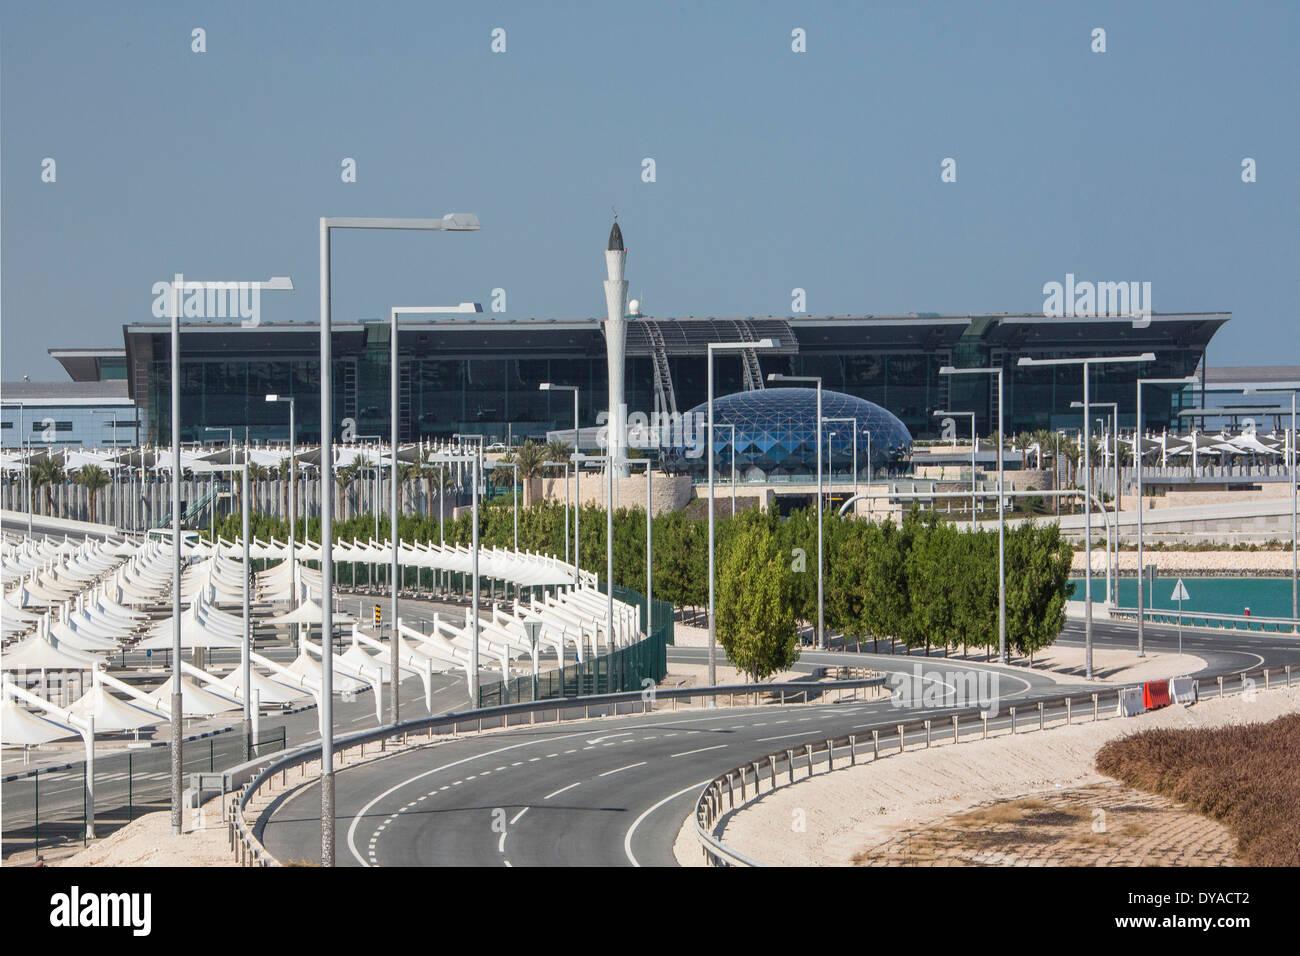 Airport Doha Ankunft